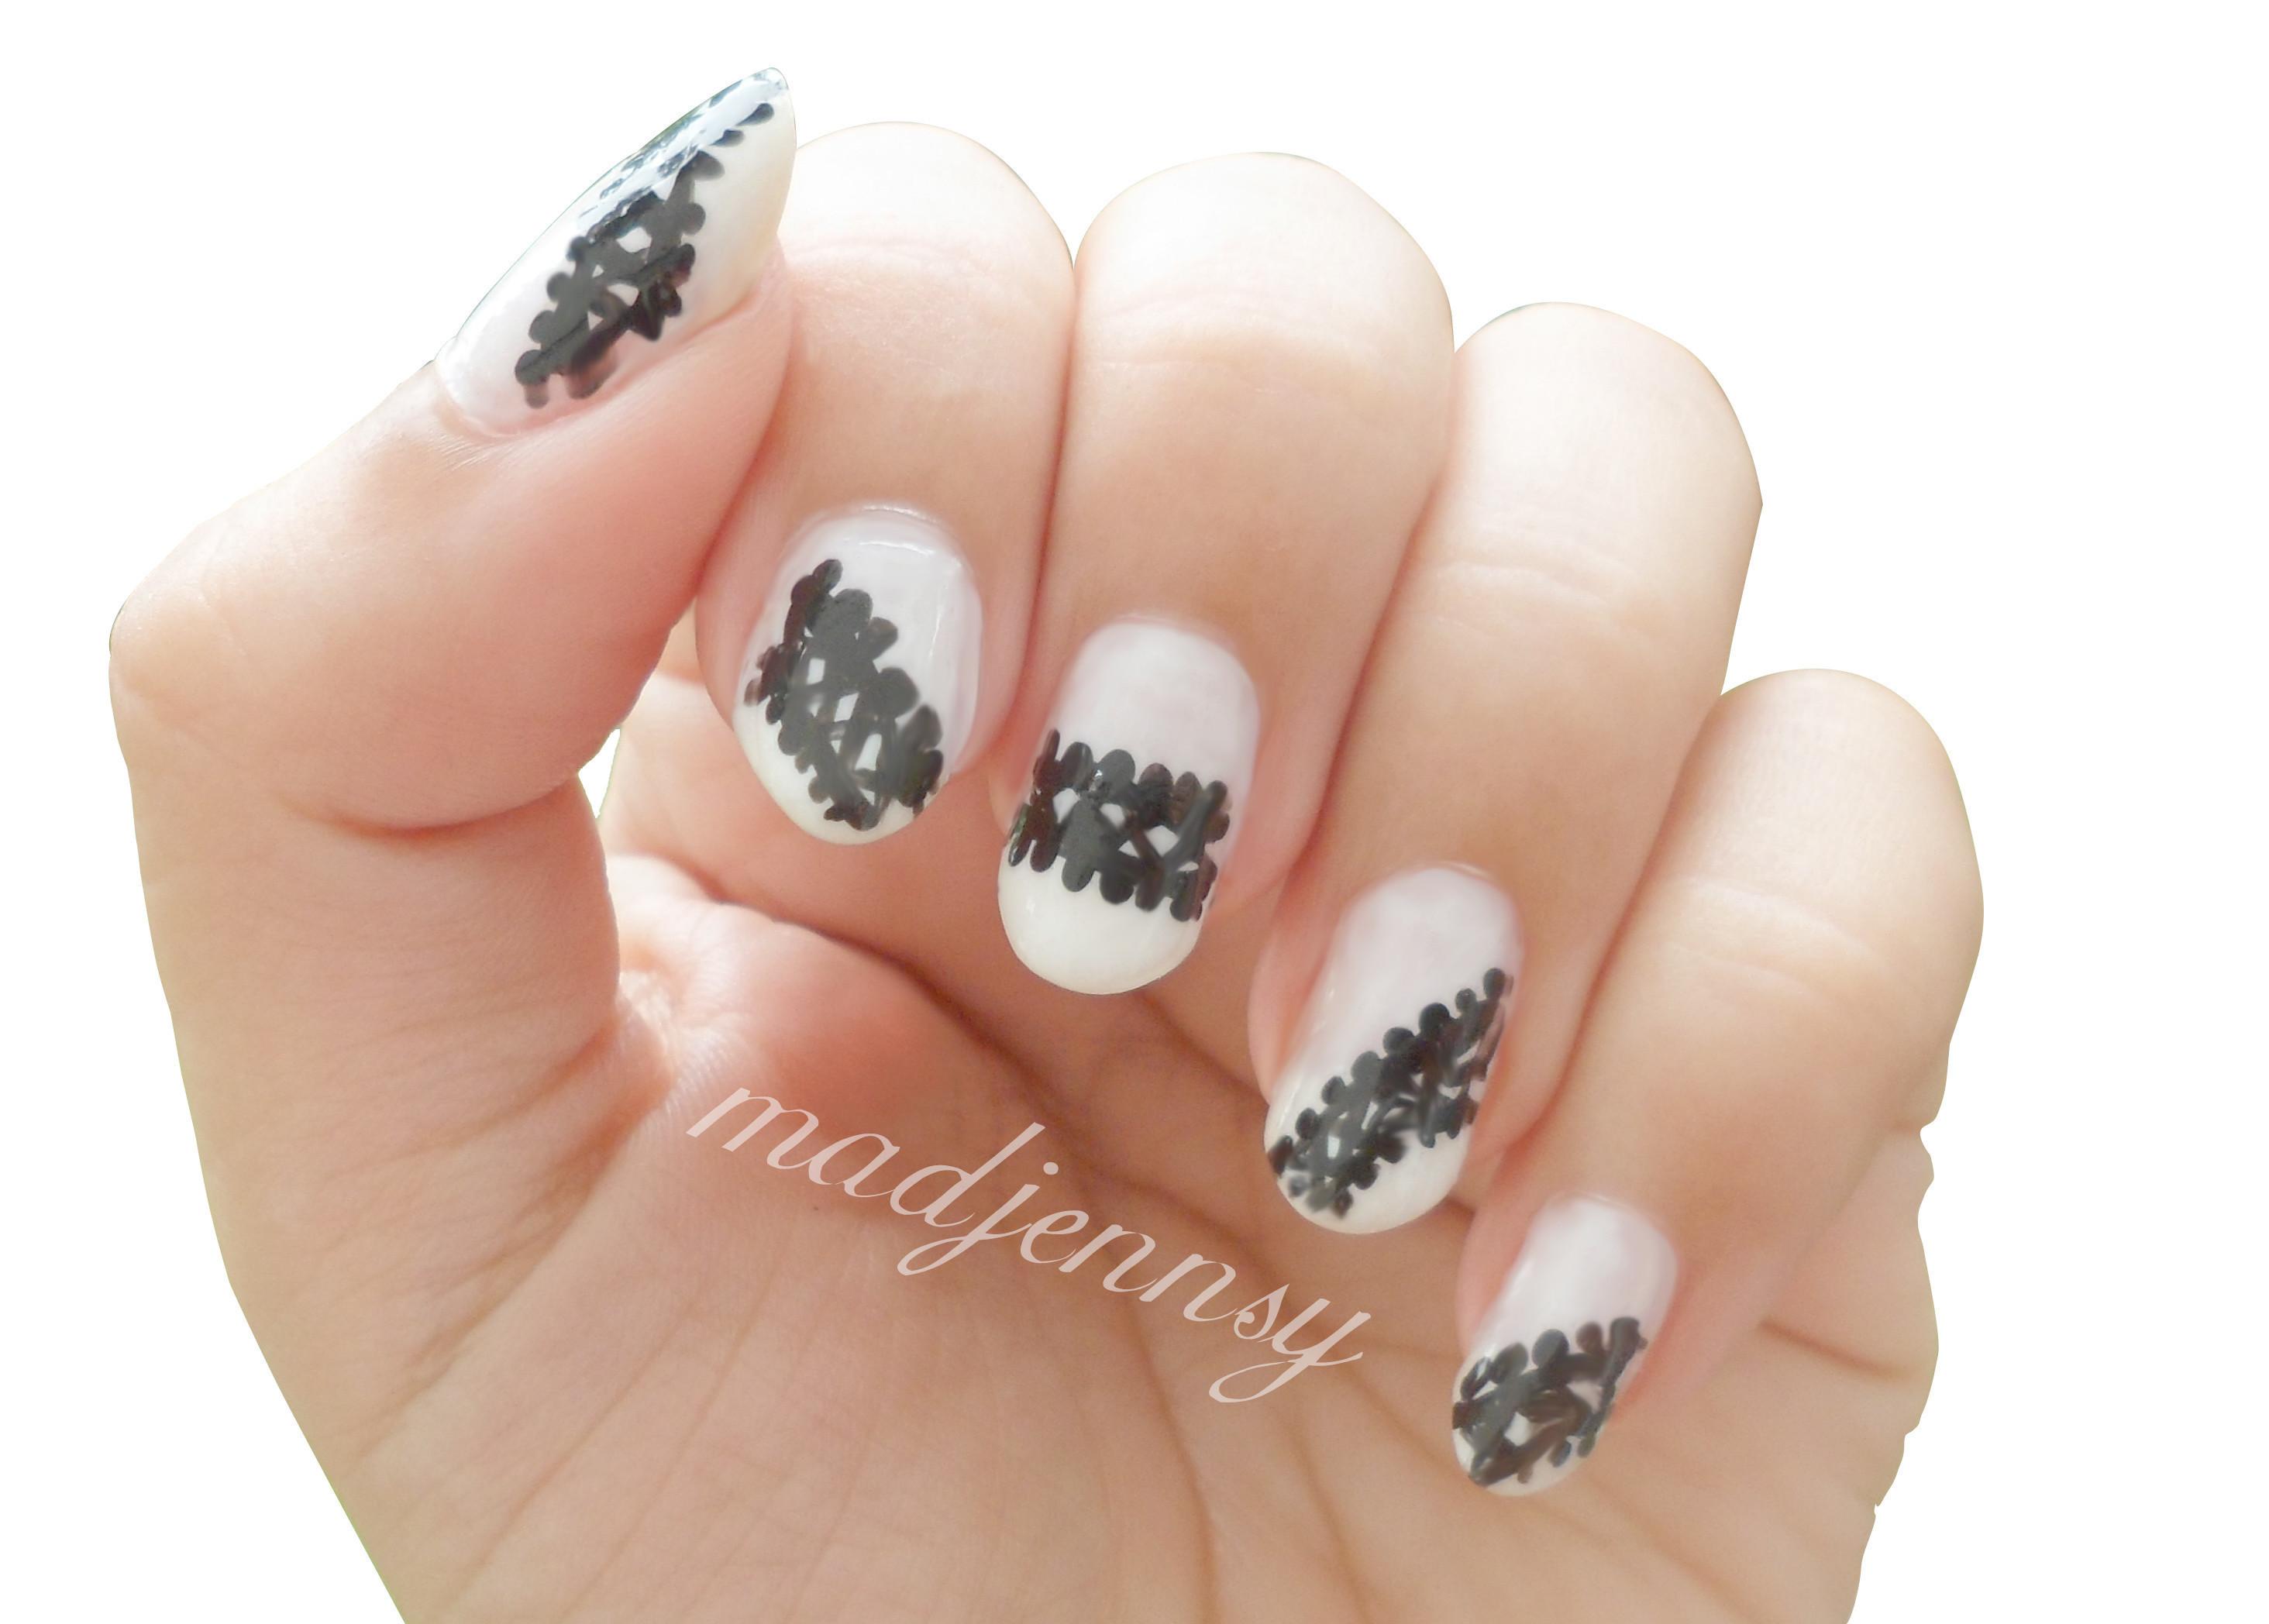 ariana grande nails tutorial